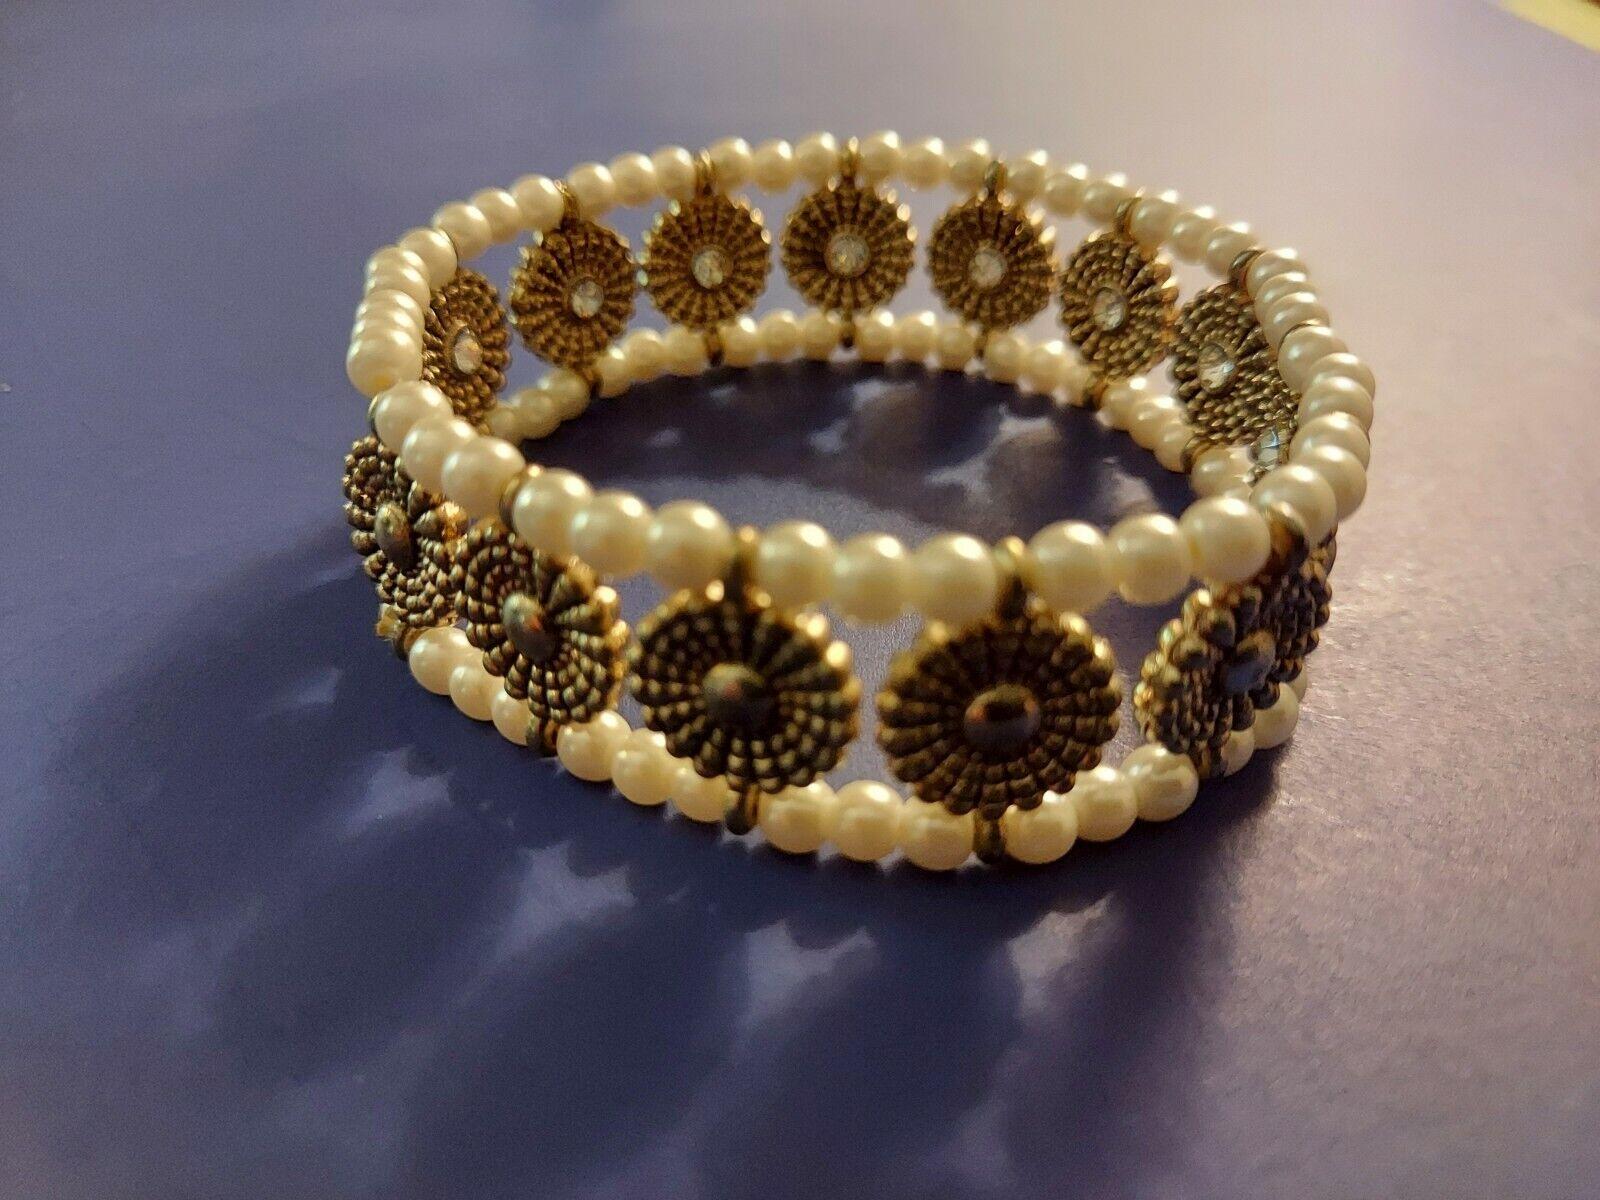 Bracelet Lot, Costume Jewelry - image 4